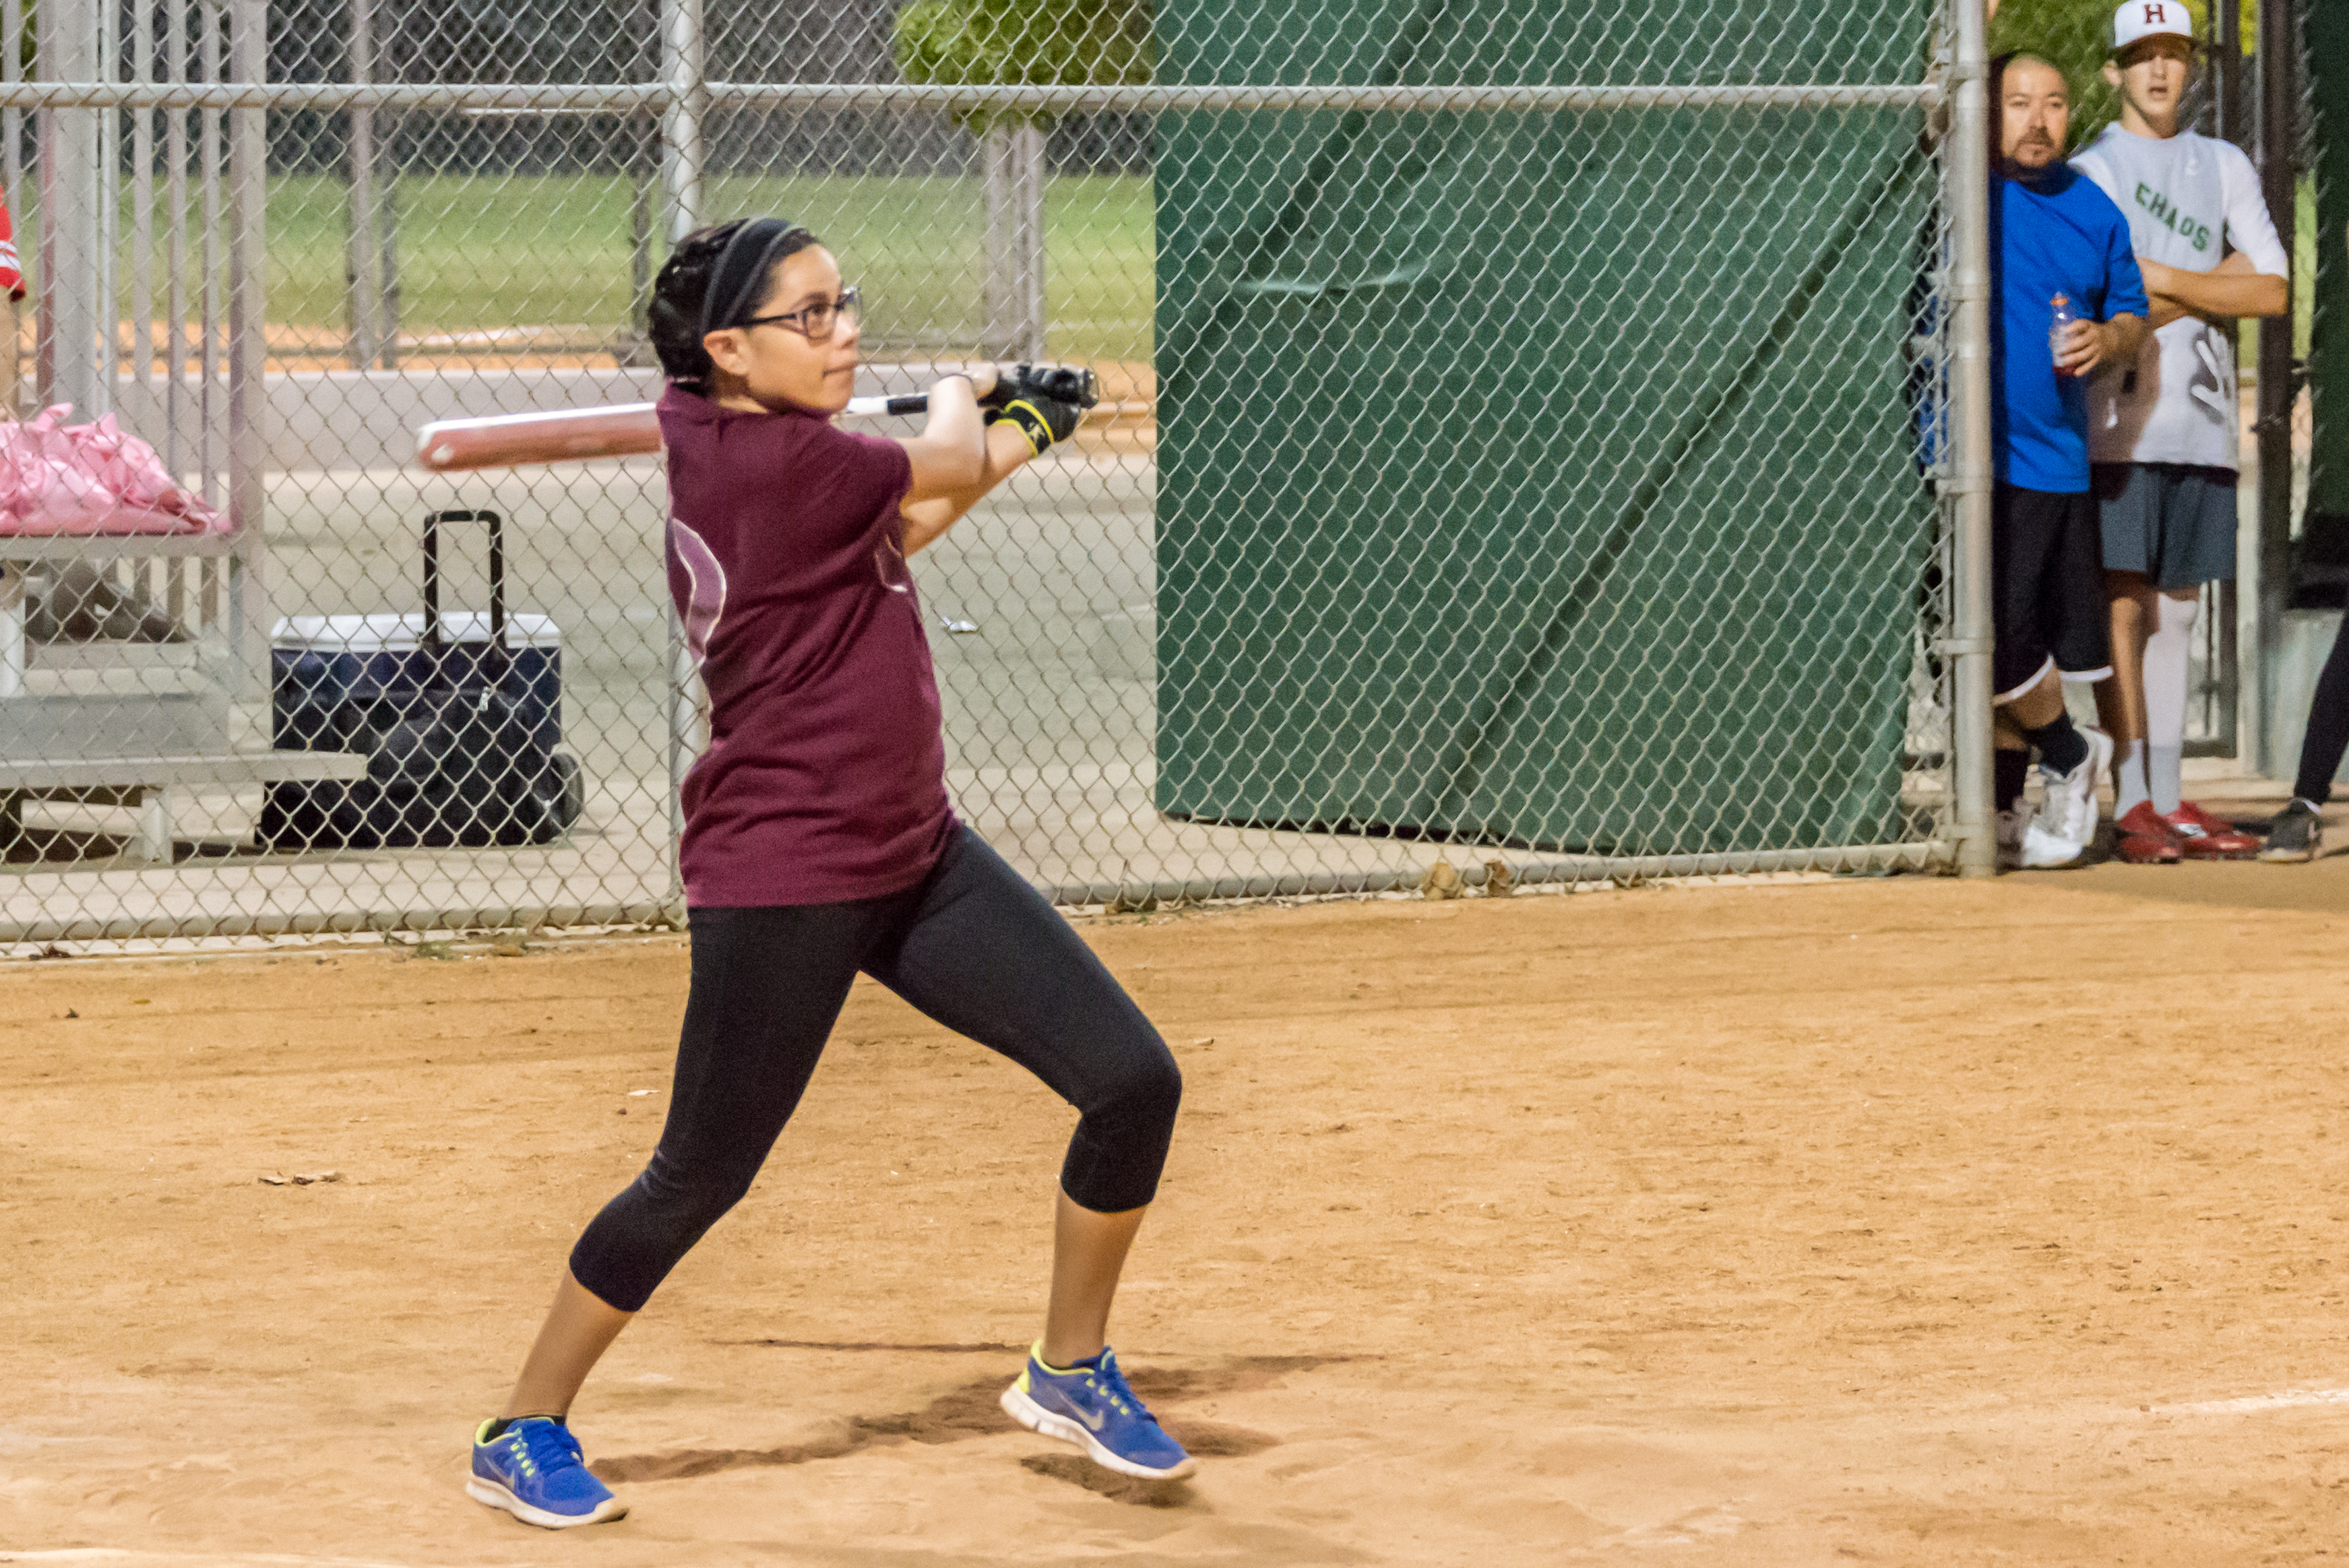 2015-06-11-baseballgame-029